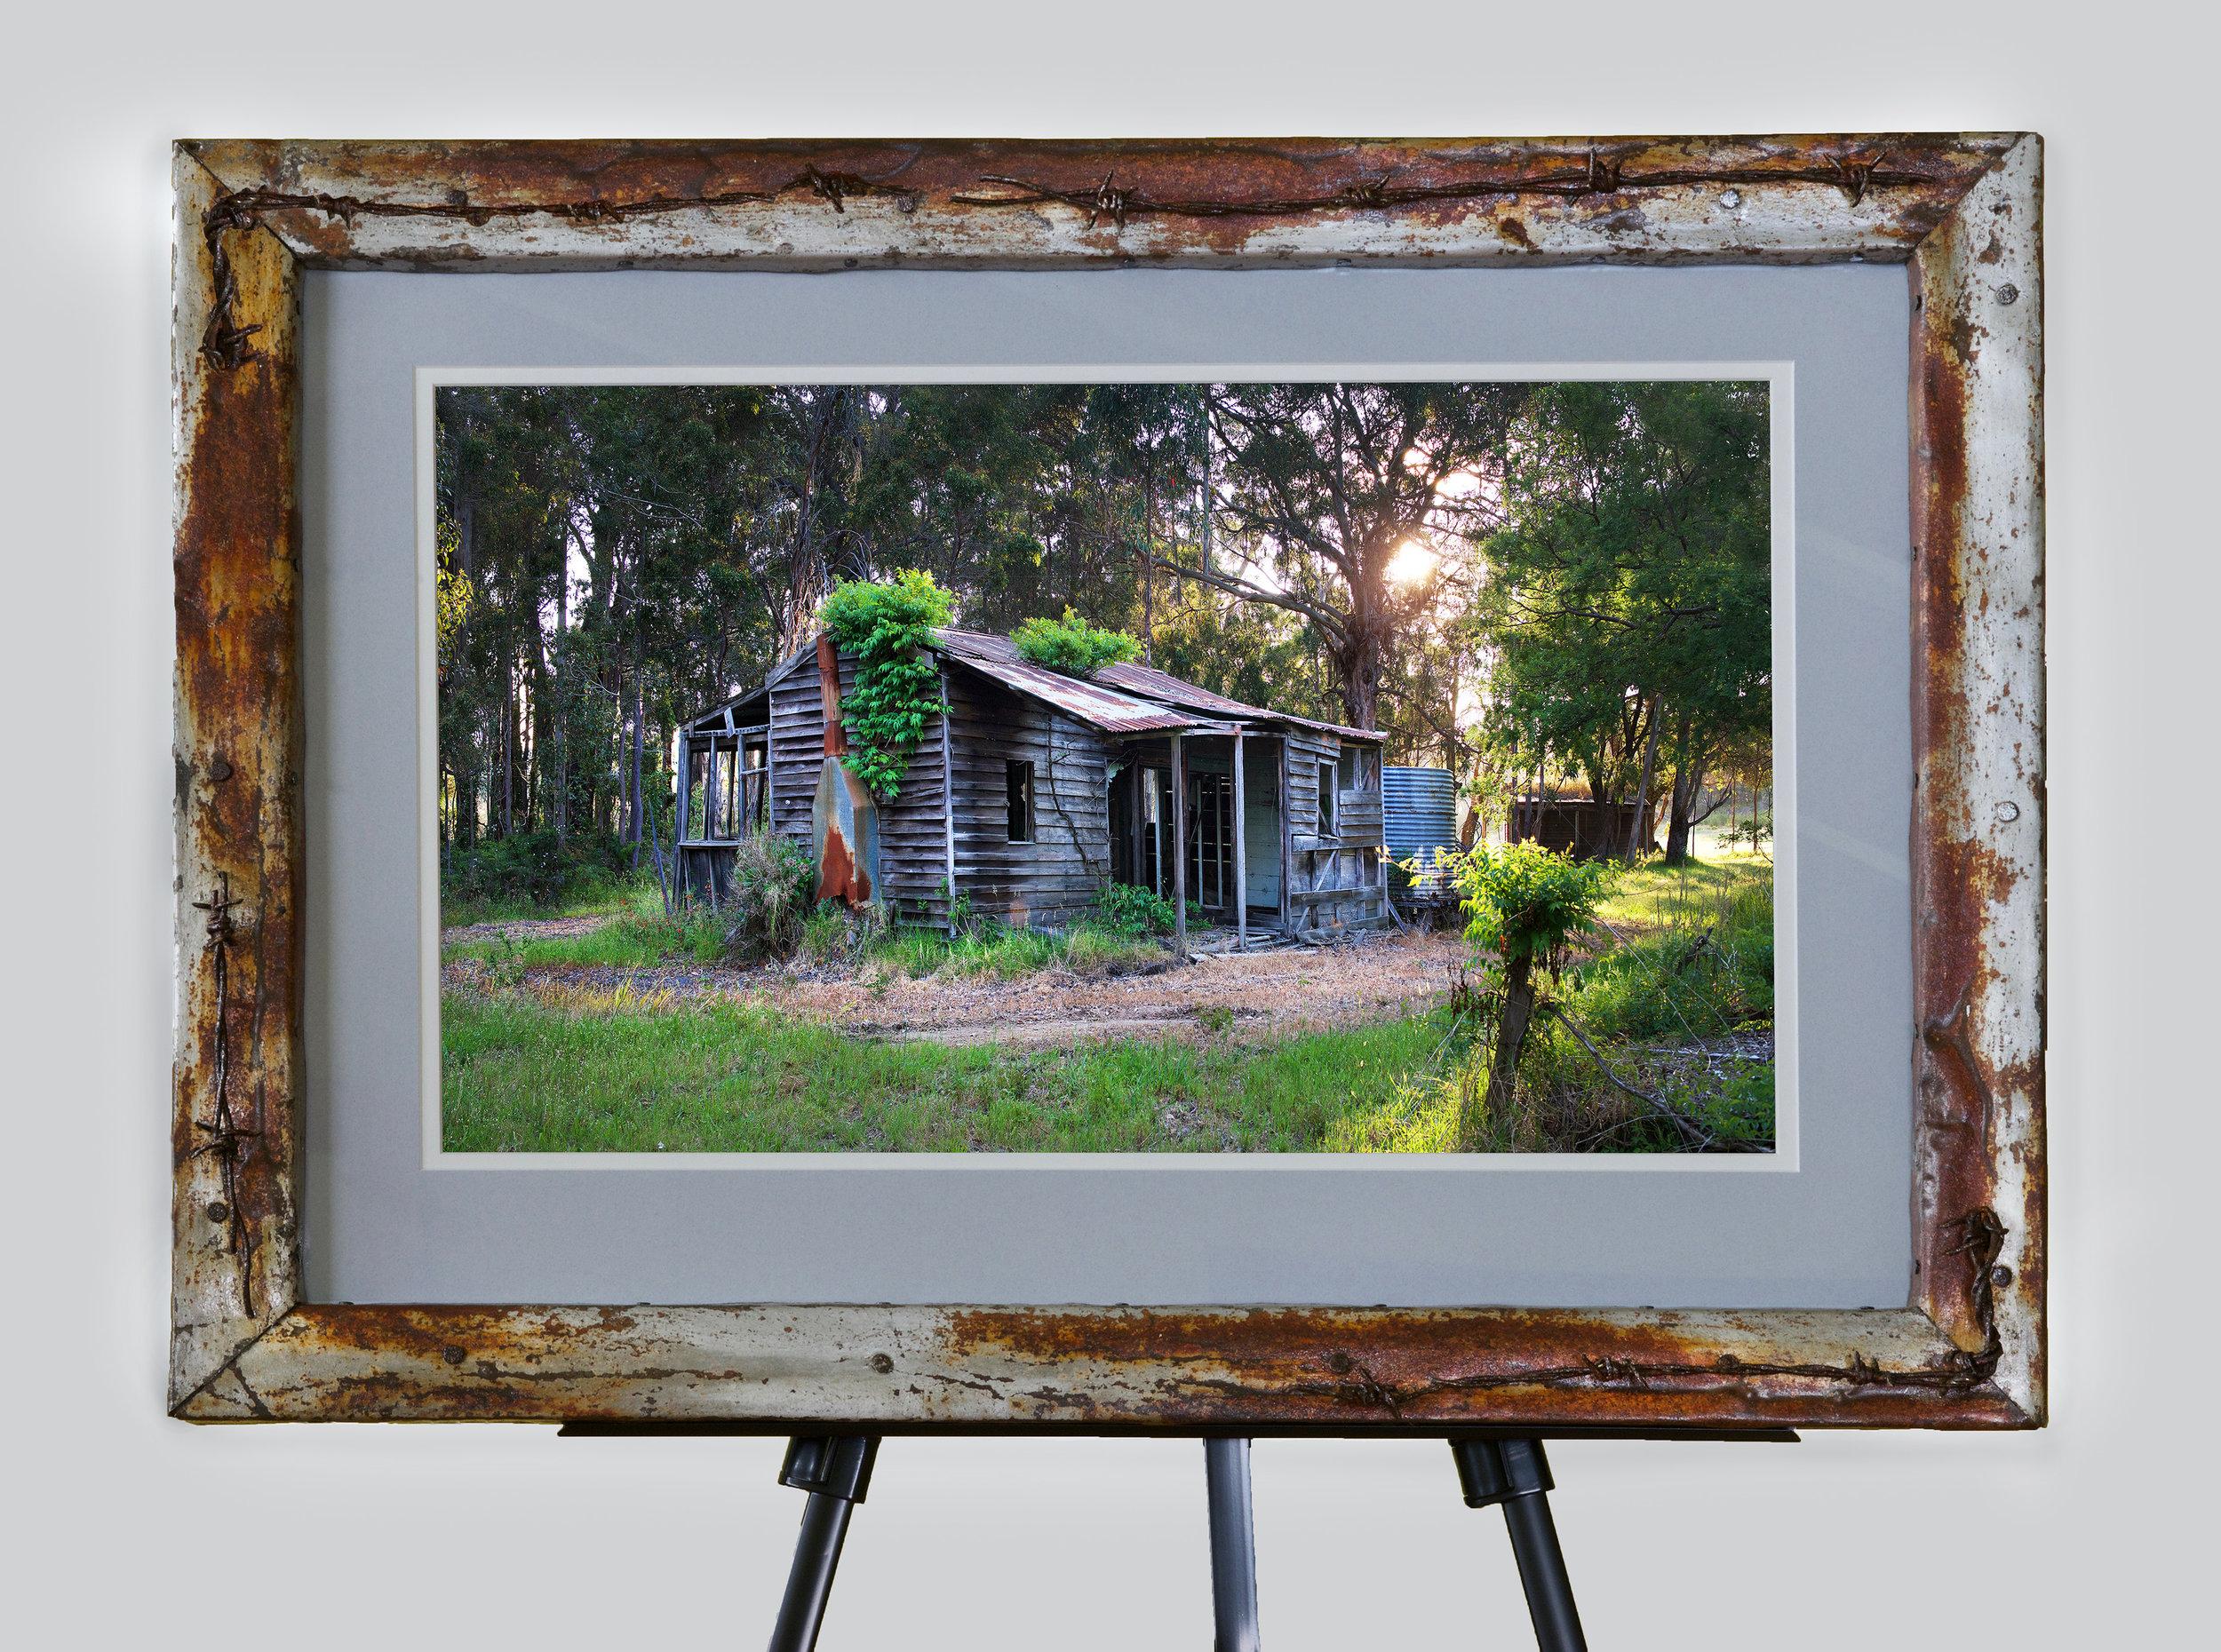 AnnieBowerman_CountryMemories_2018_CorrugatedIron&BarbedWire_700x520mm.jpg